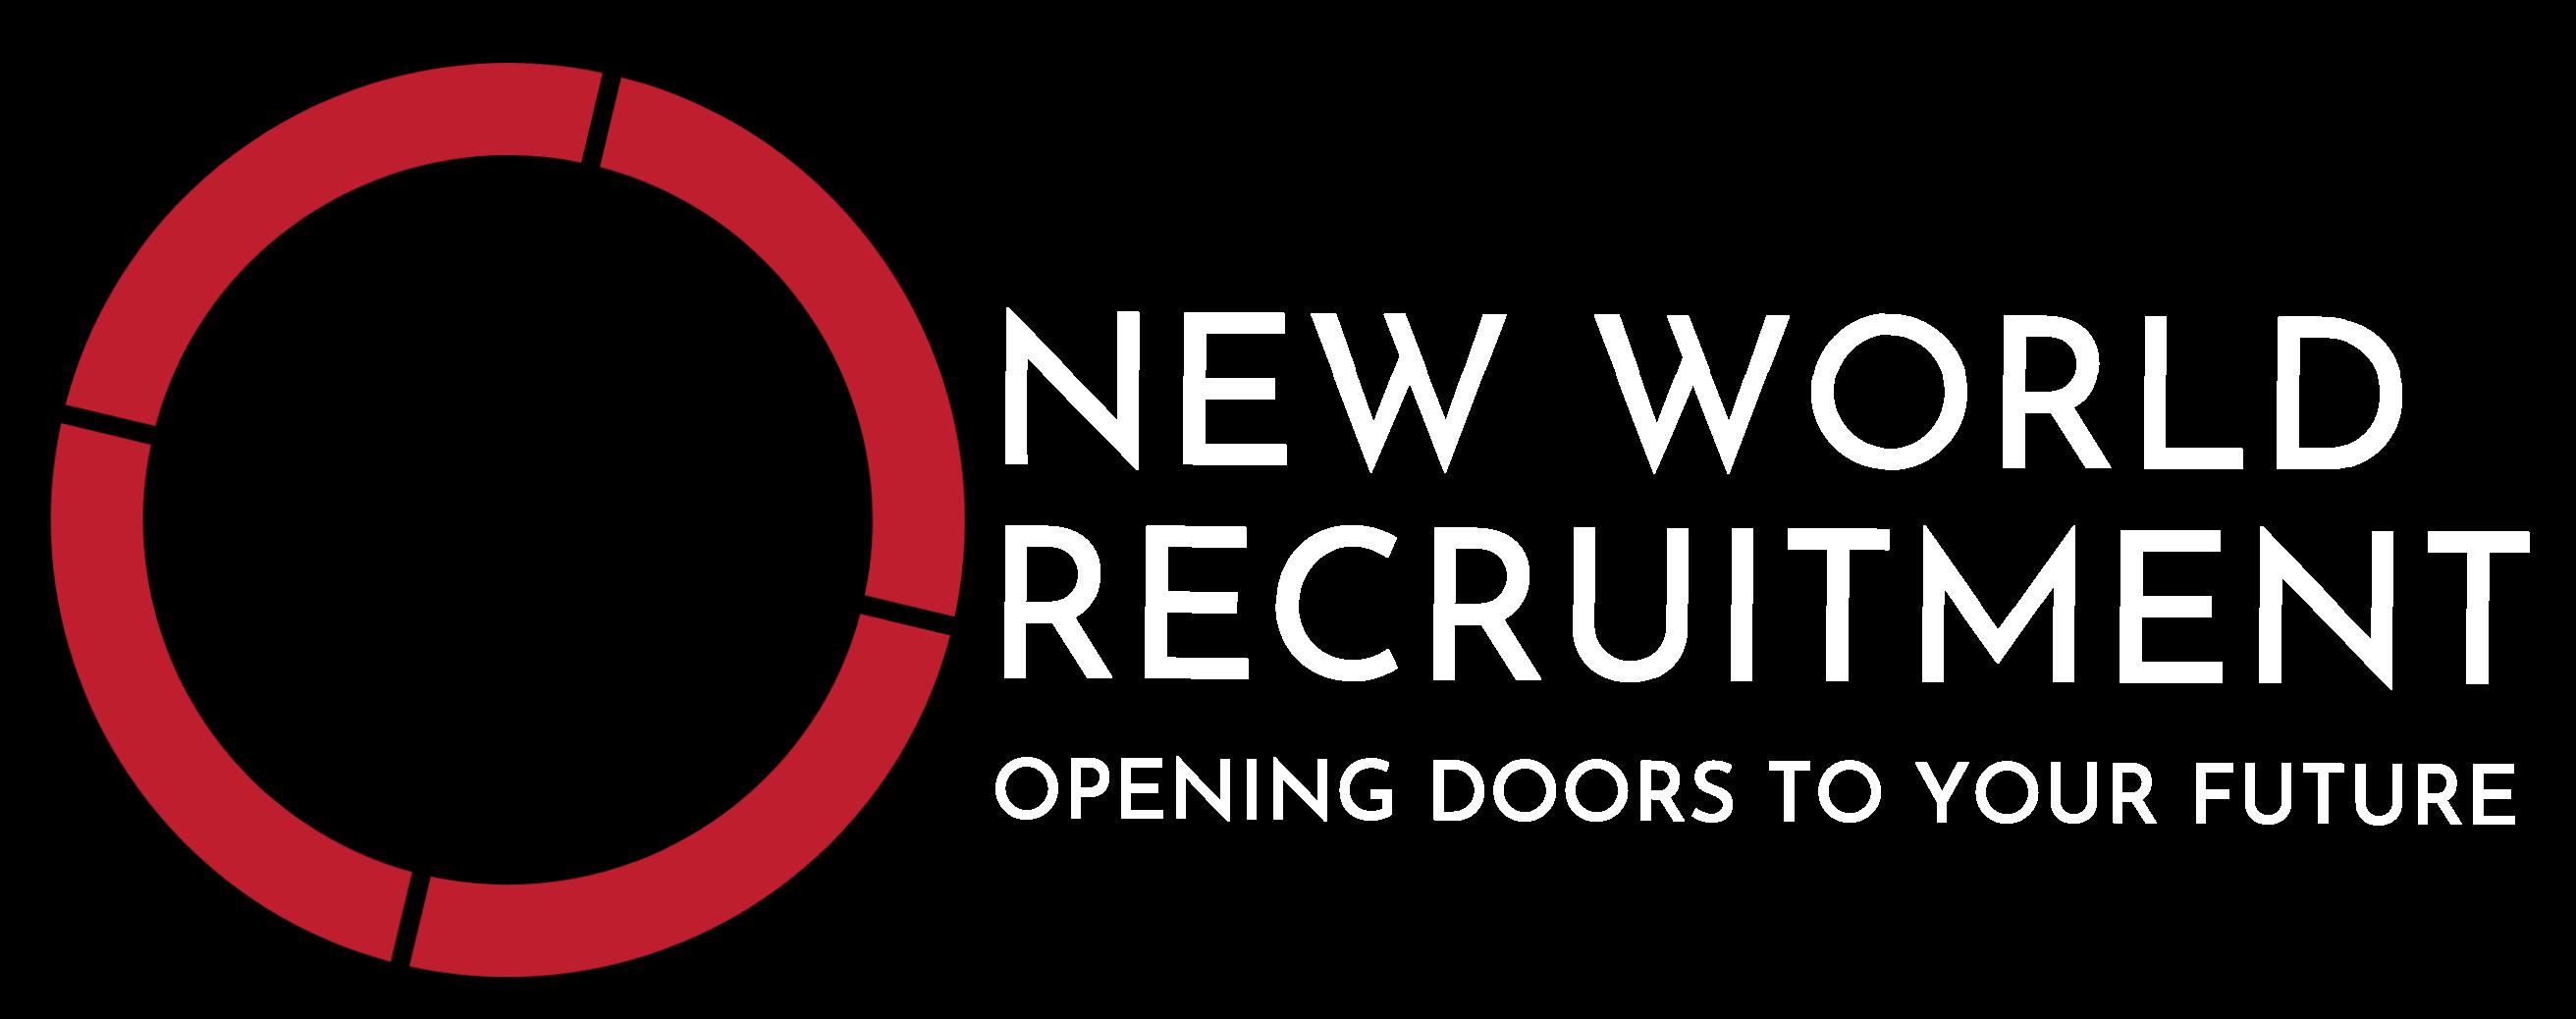 New World Recruitment